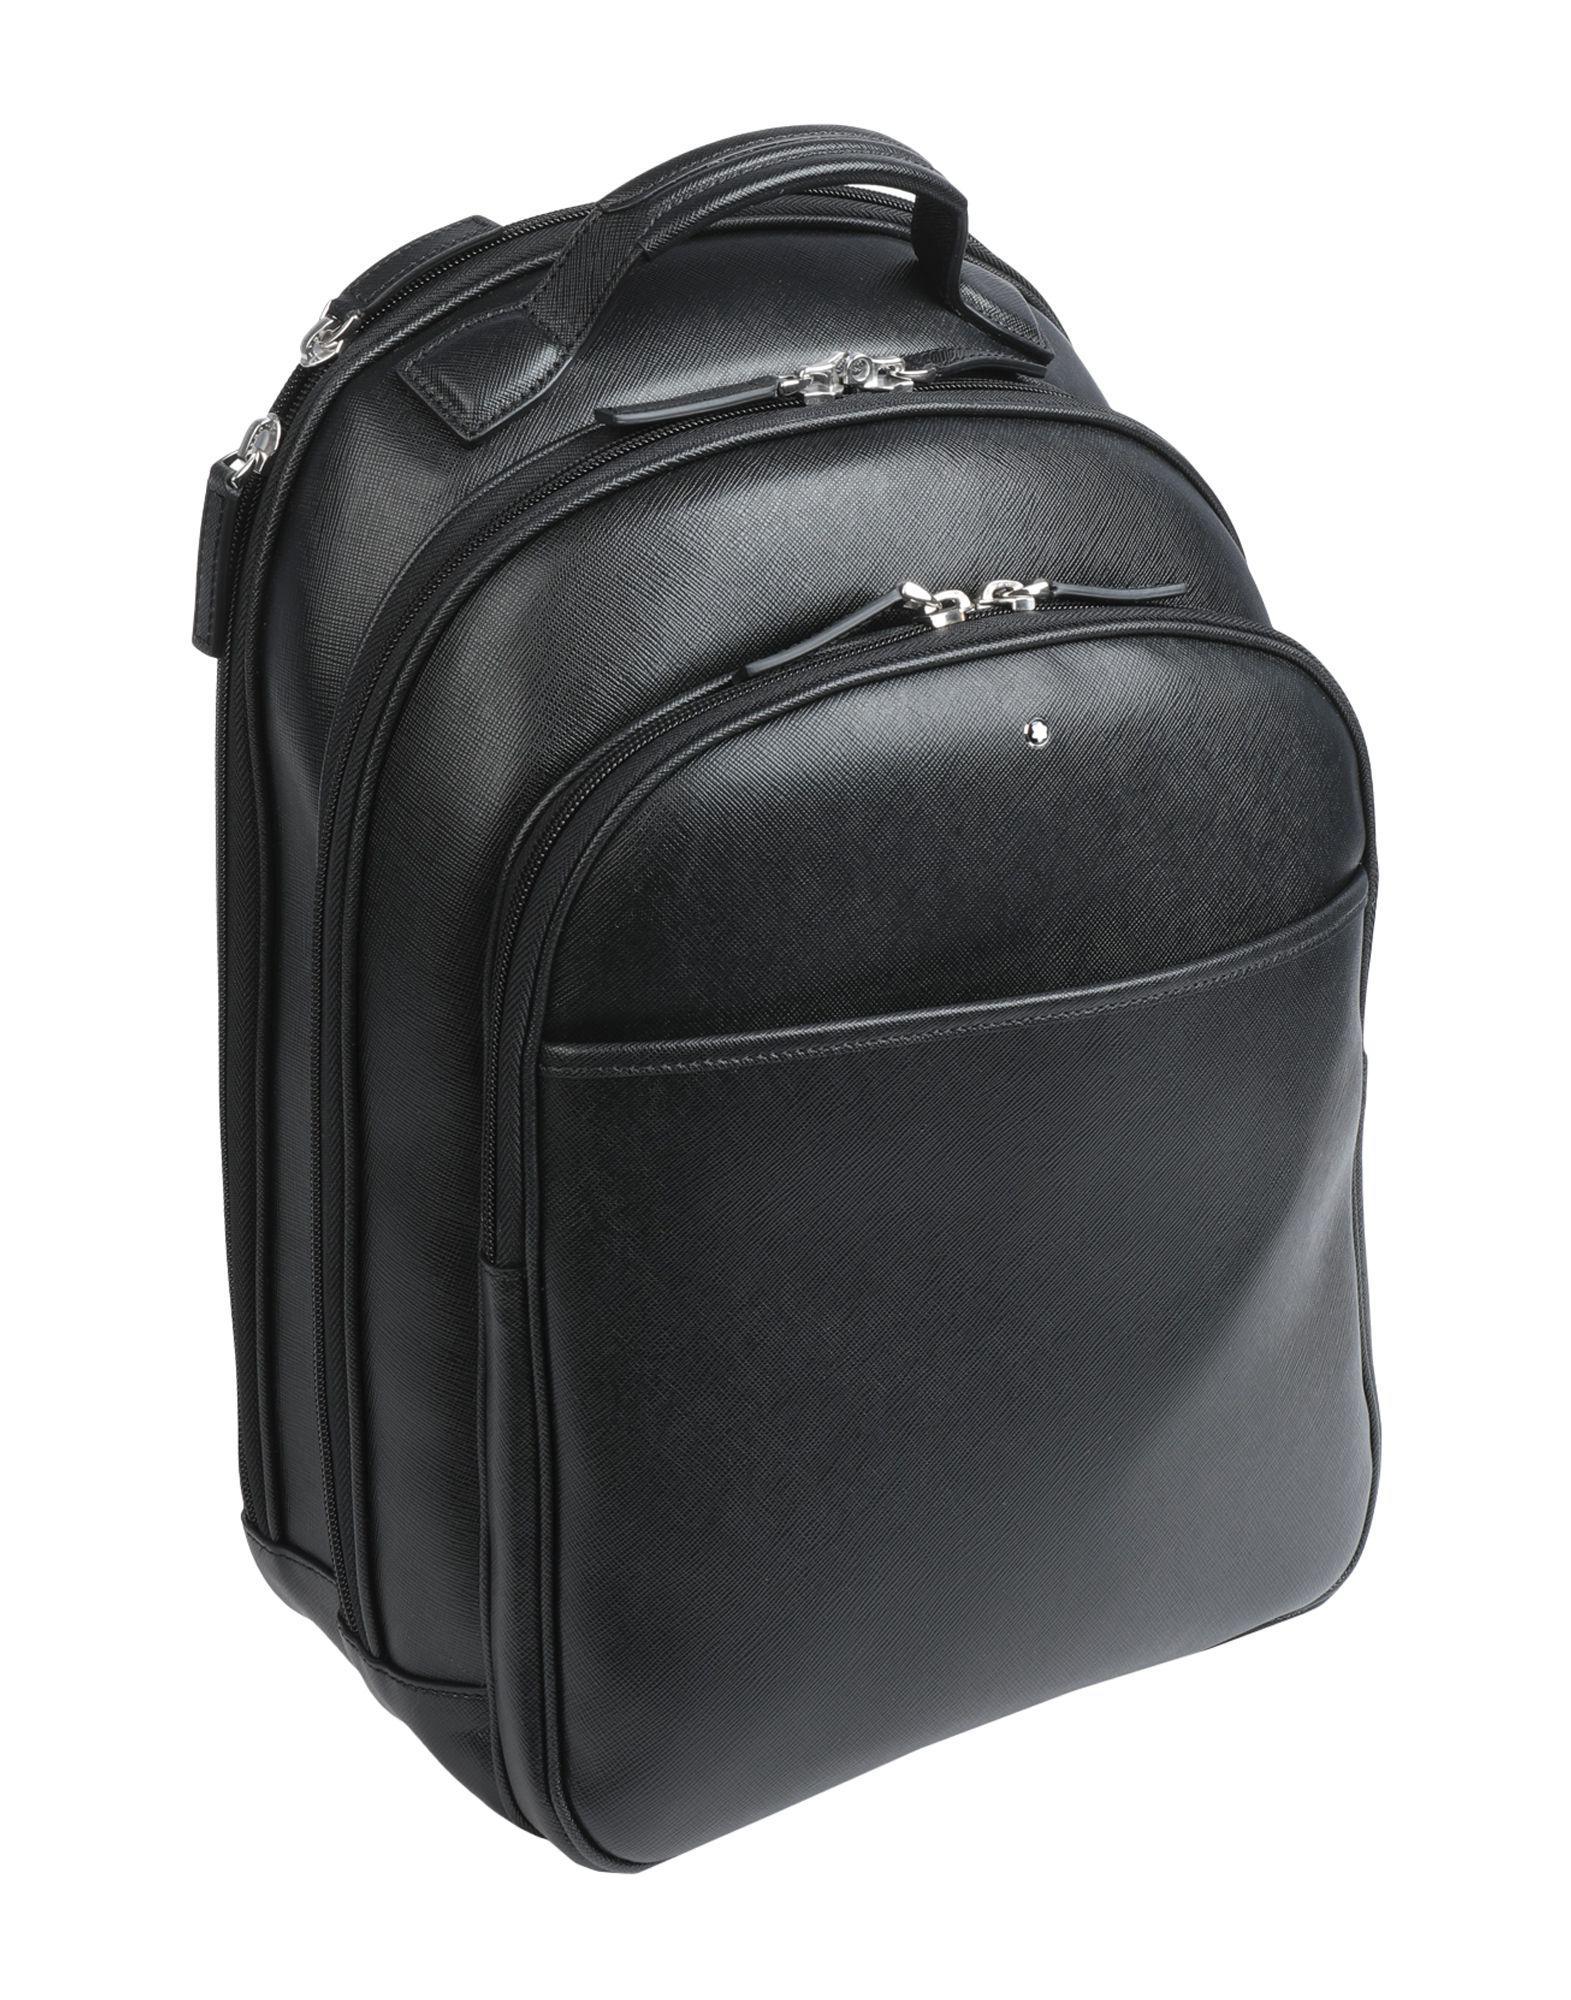 7143ea6bf236 Montblanc - Black Backpacks   Bum Bags for Men - Lyst. View fullscreen